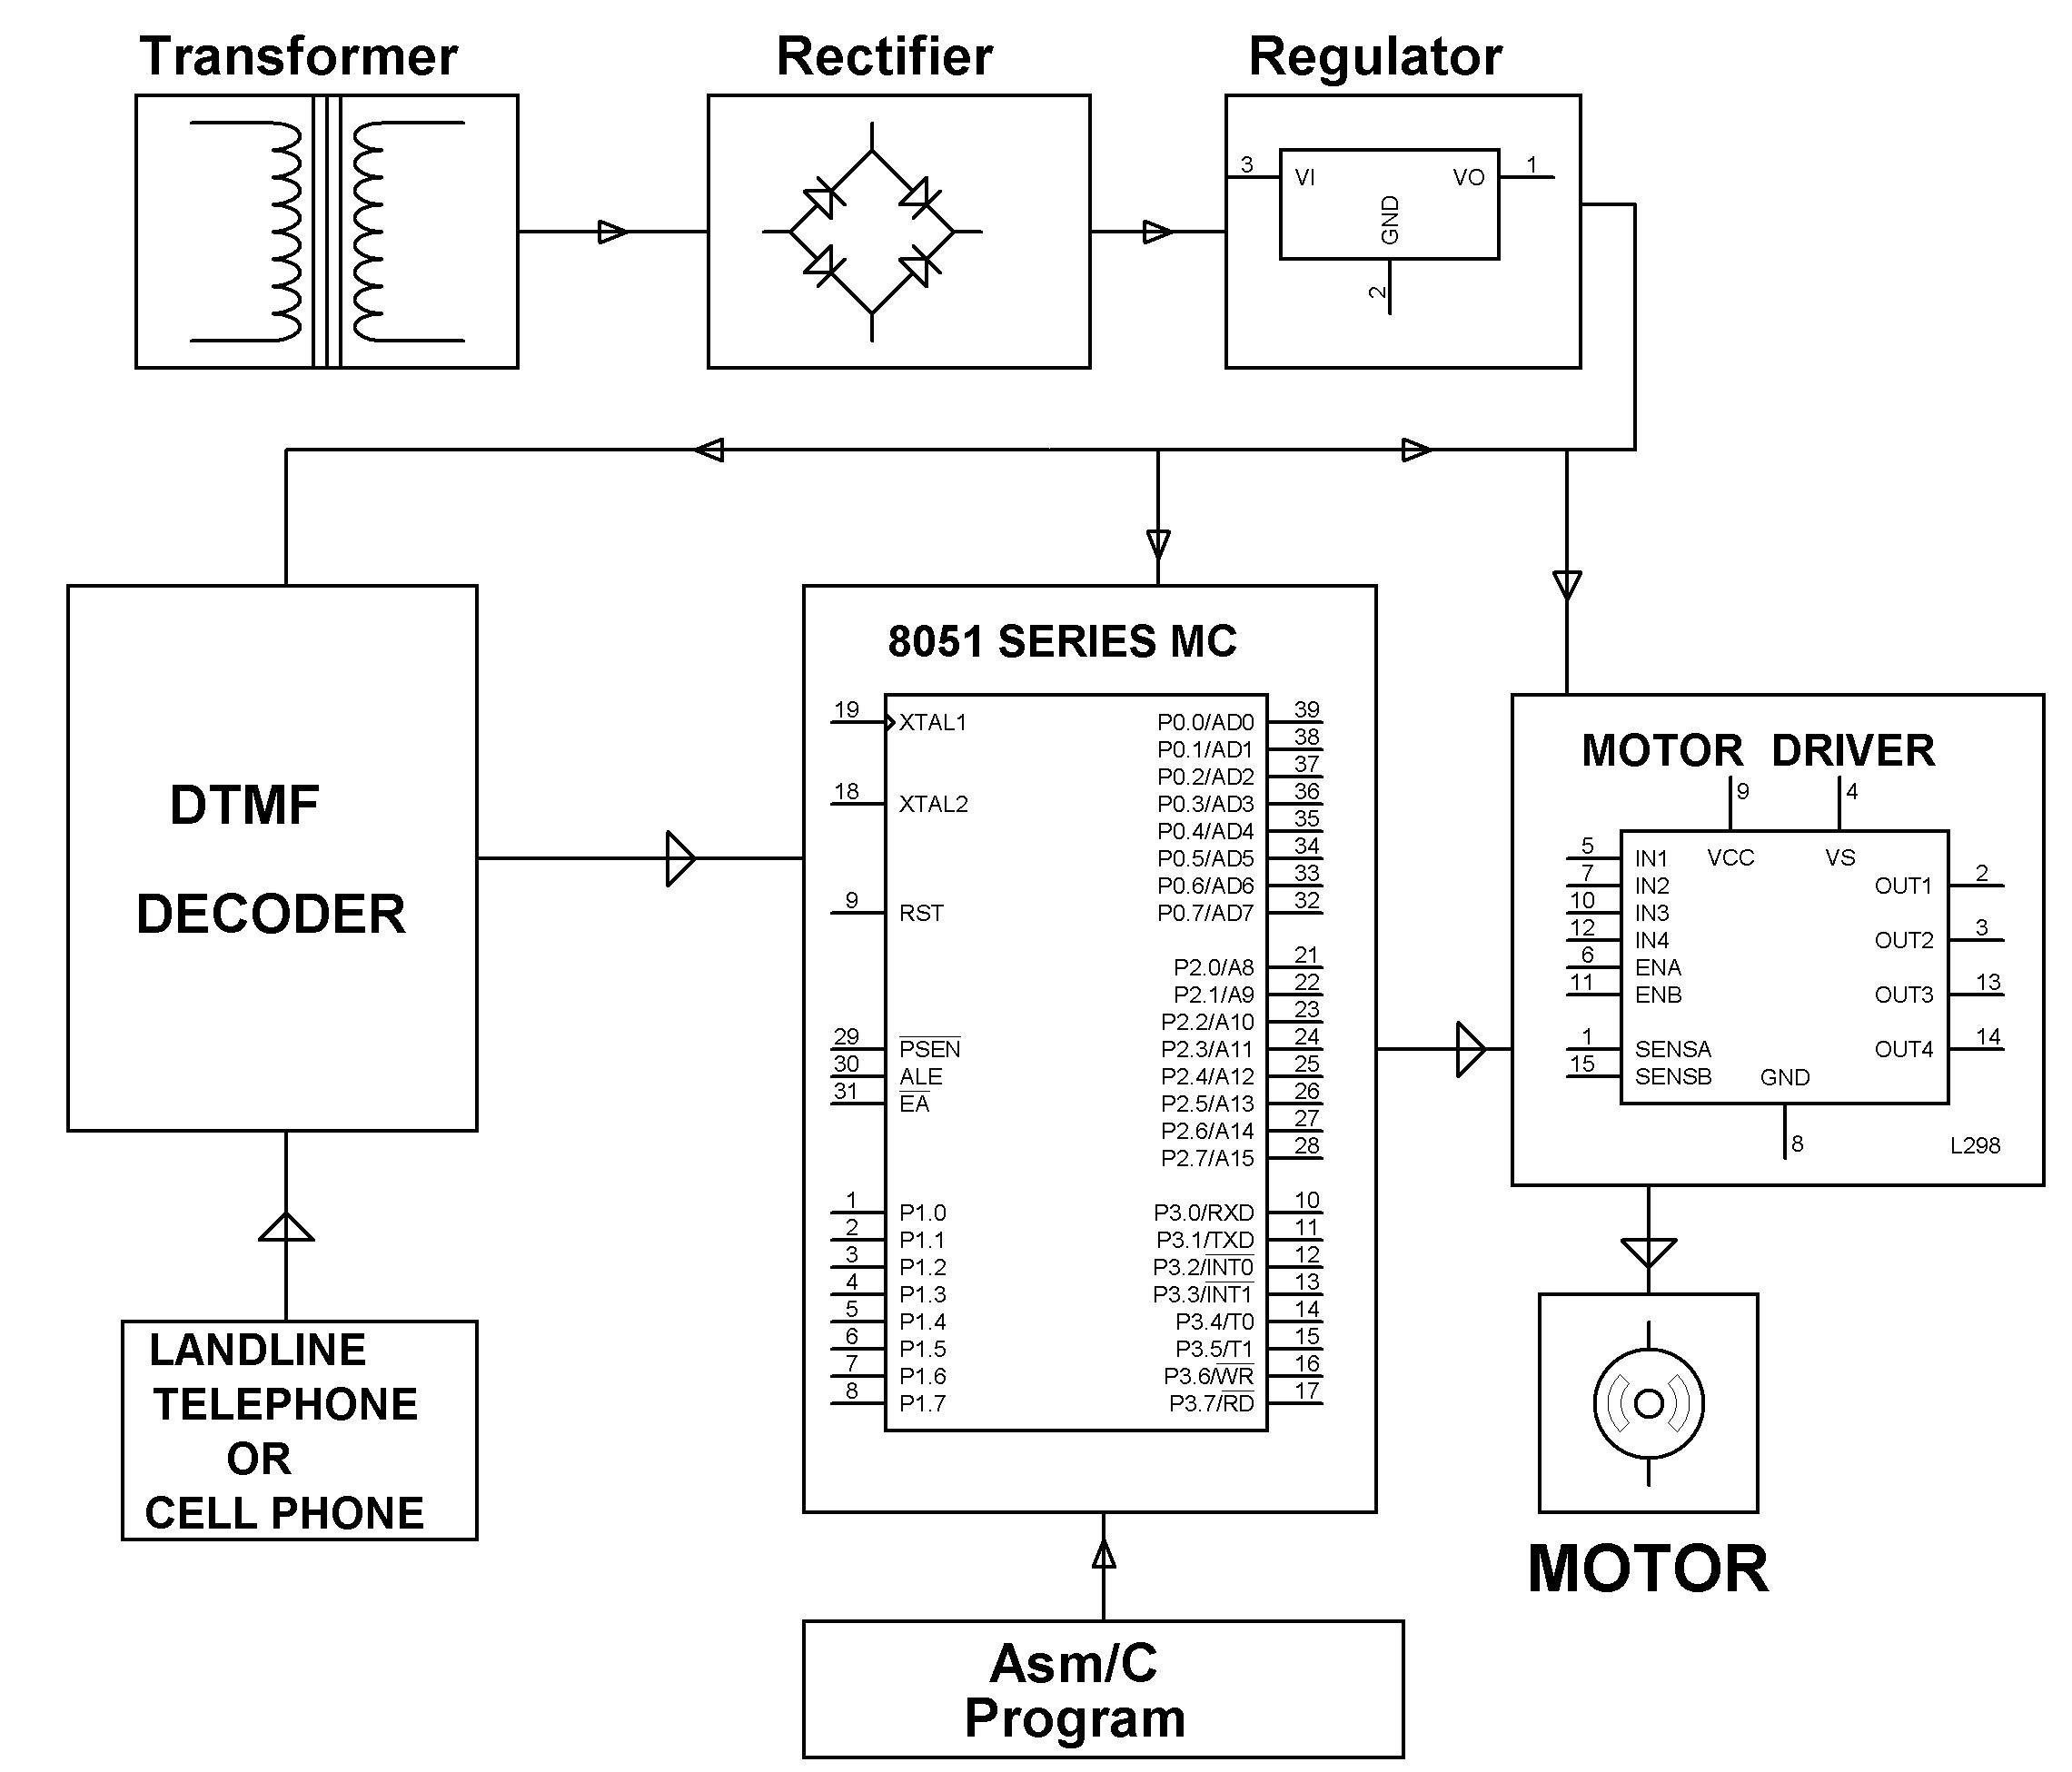 small resolution of garage door opener control diagrams wiring diagram expert block diagram of dtmf control based automatic garage